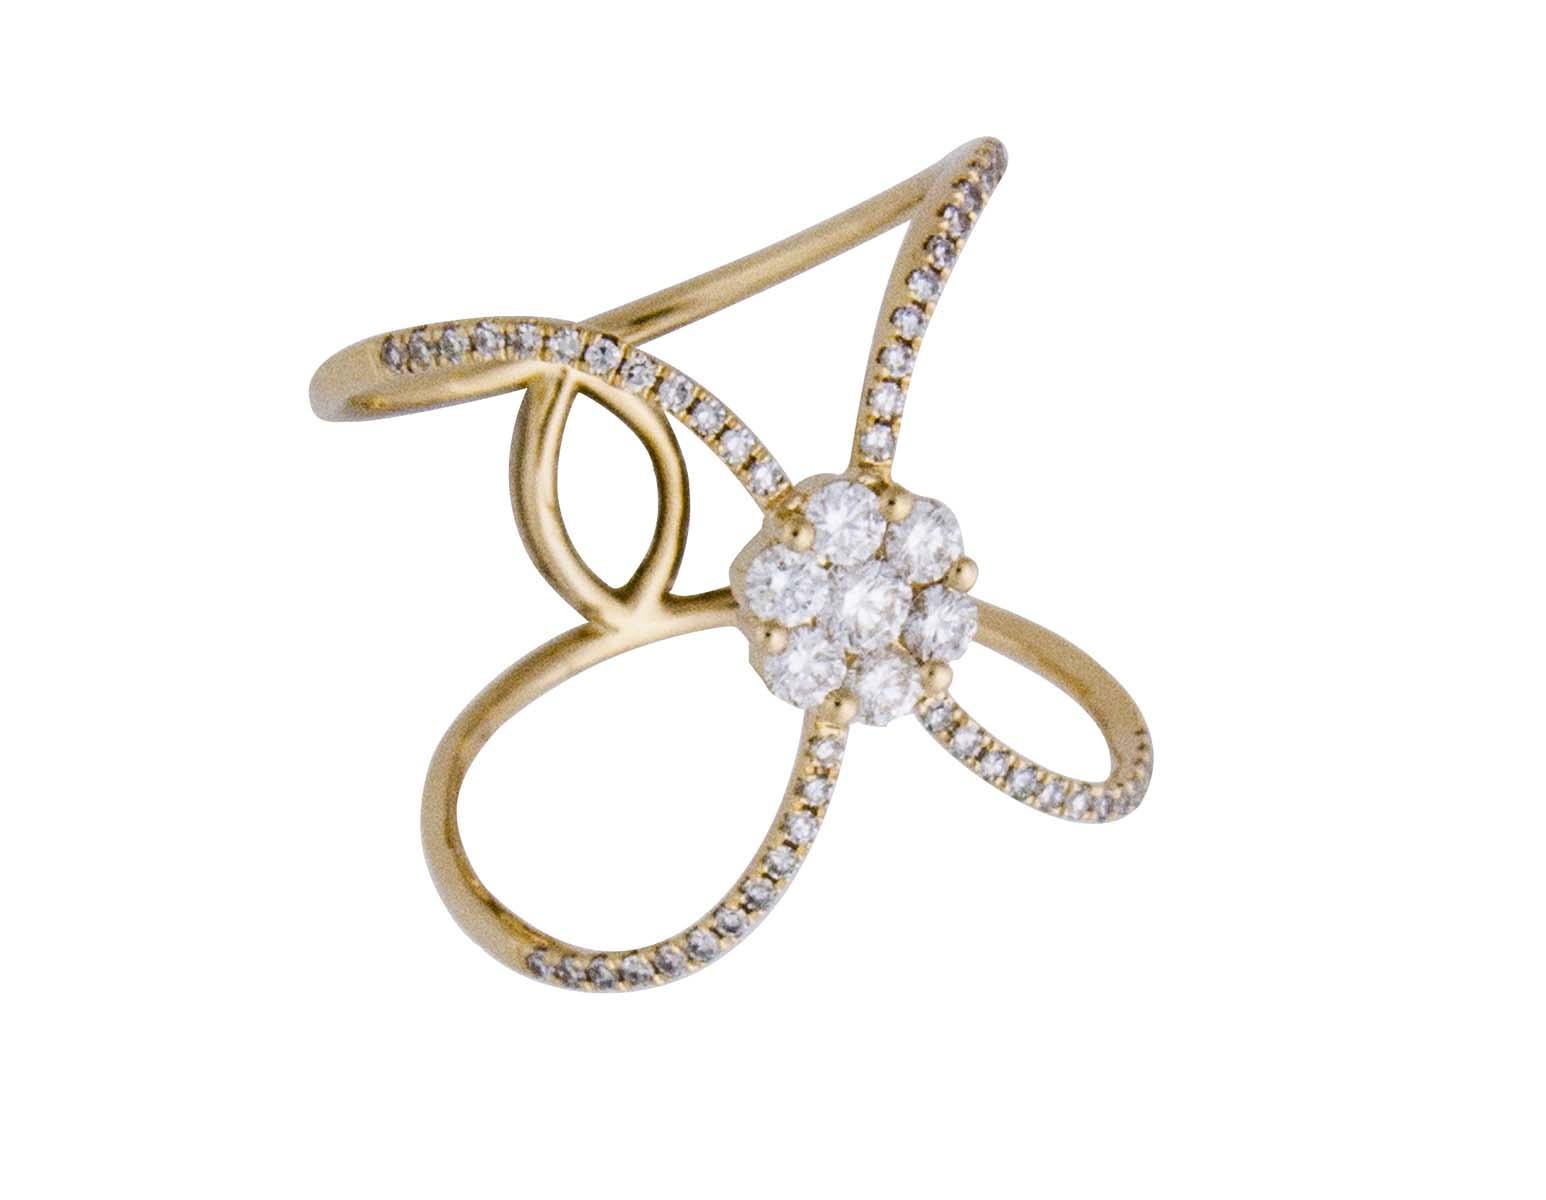 18k open pattern yellow gold and diamond ring